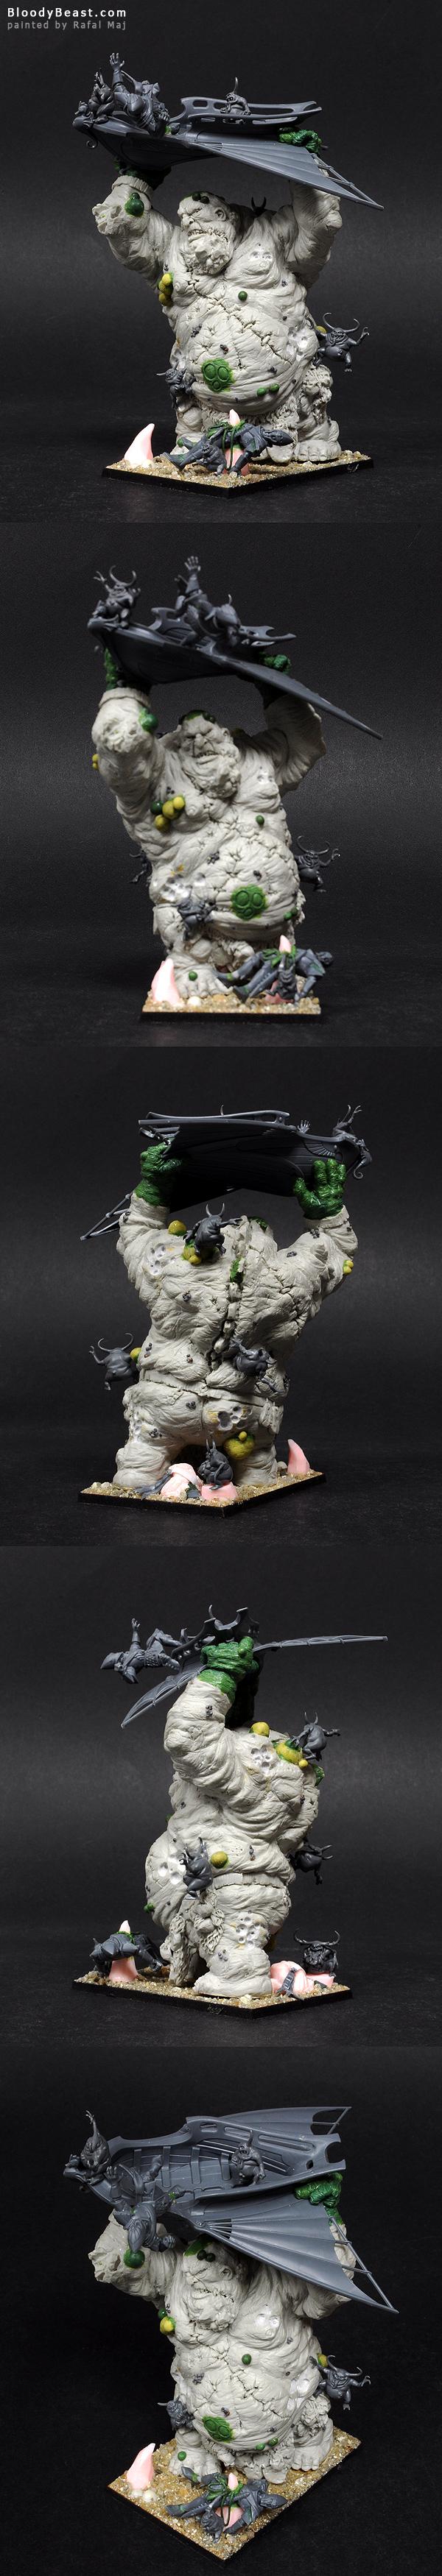 Scibor's Stone Giant as Nurgle Giant WIP by Rafal Maj (BloodyBeast.com)